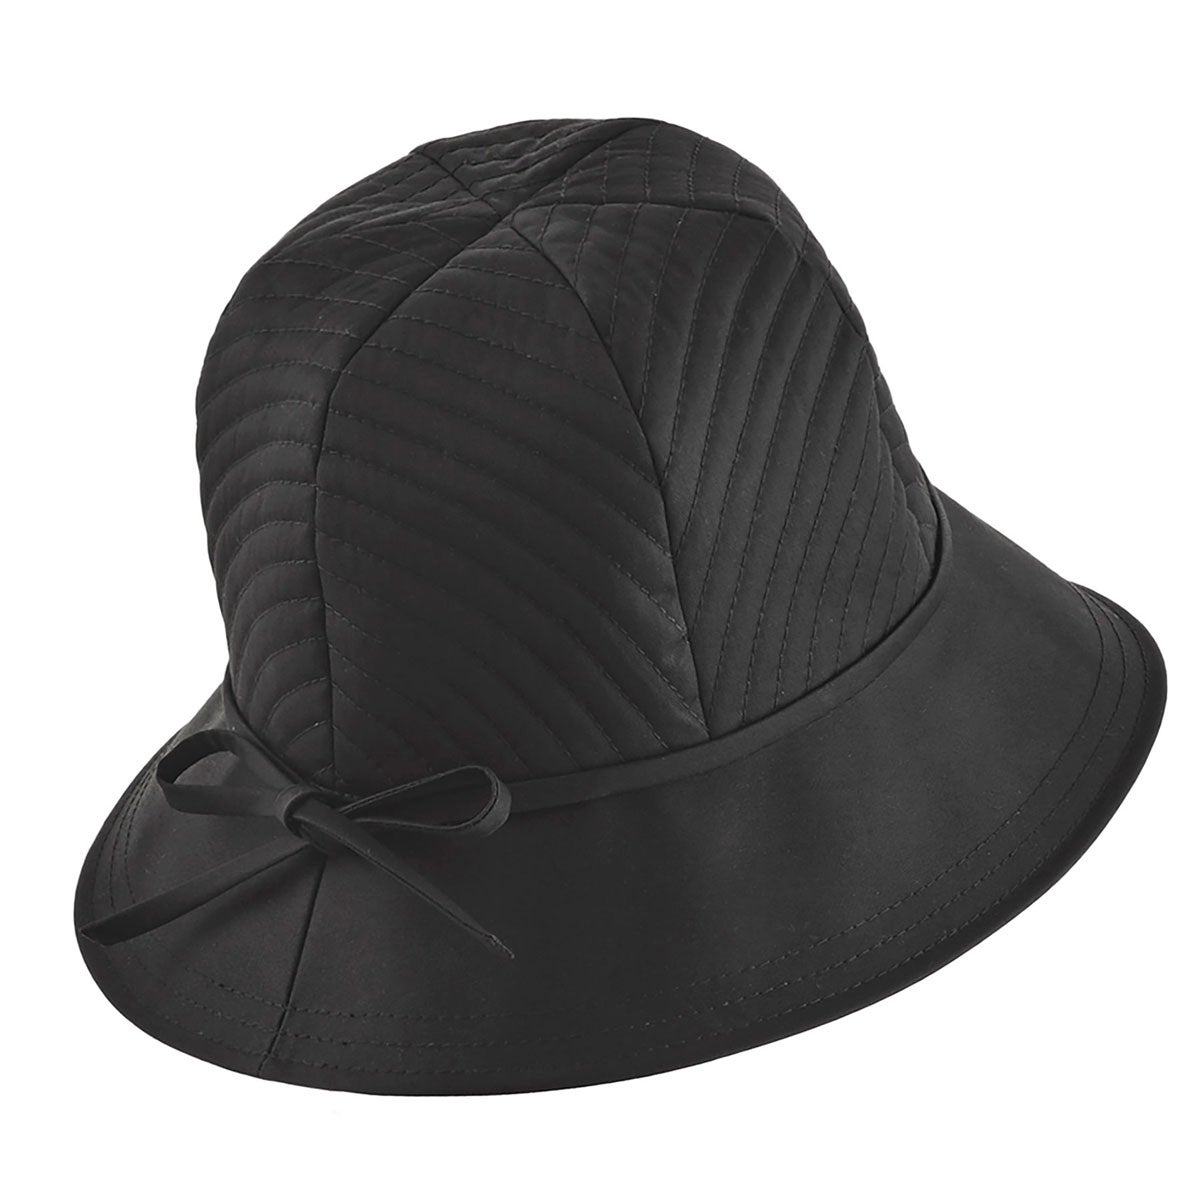 1950s Hats: Pillbox, Fascinator, Wedding, Sun Hats Nanci $87.50 AT vintagedancer.com